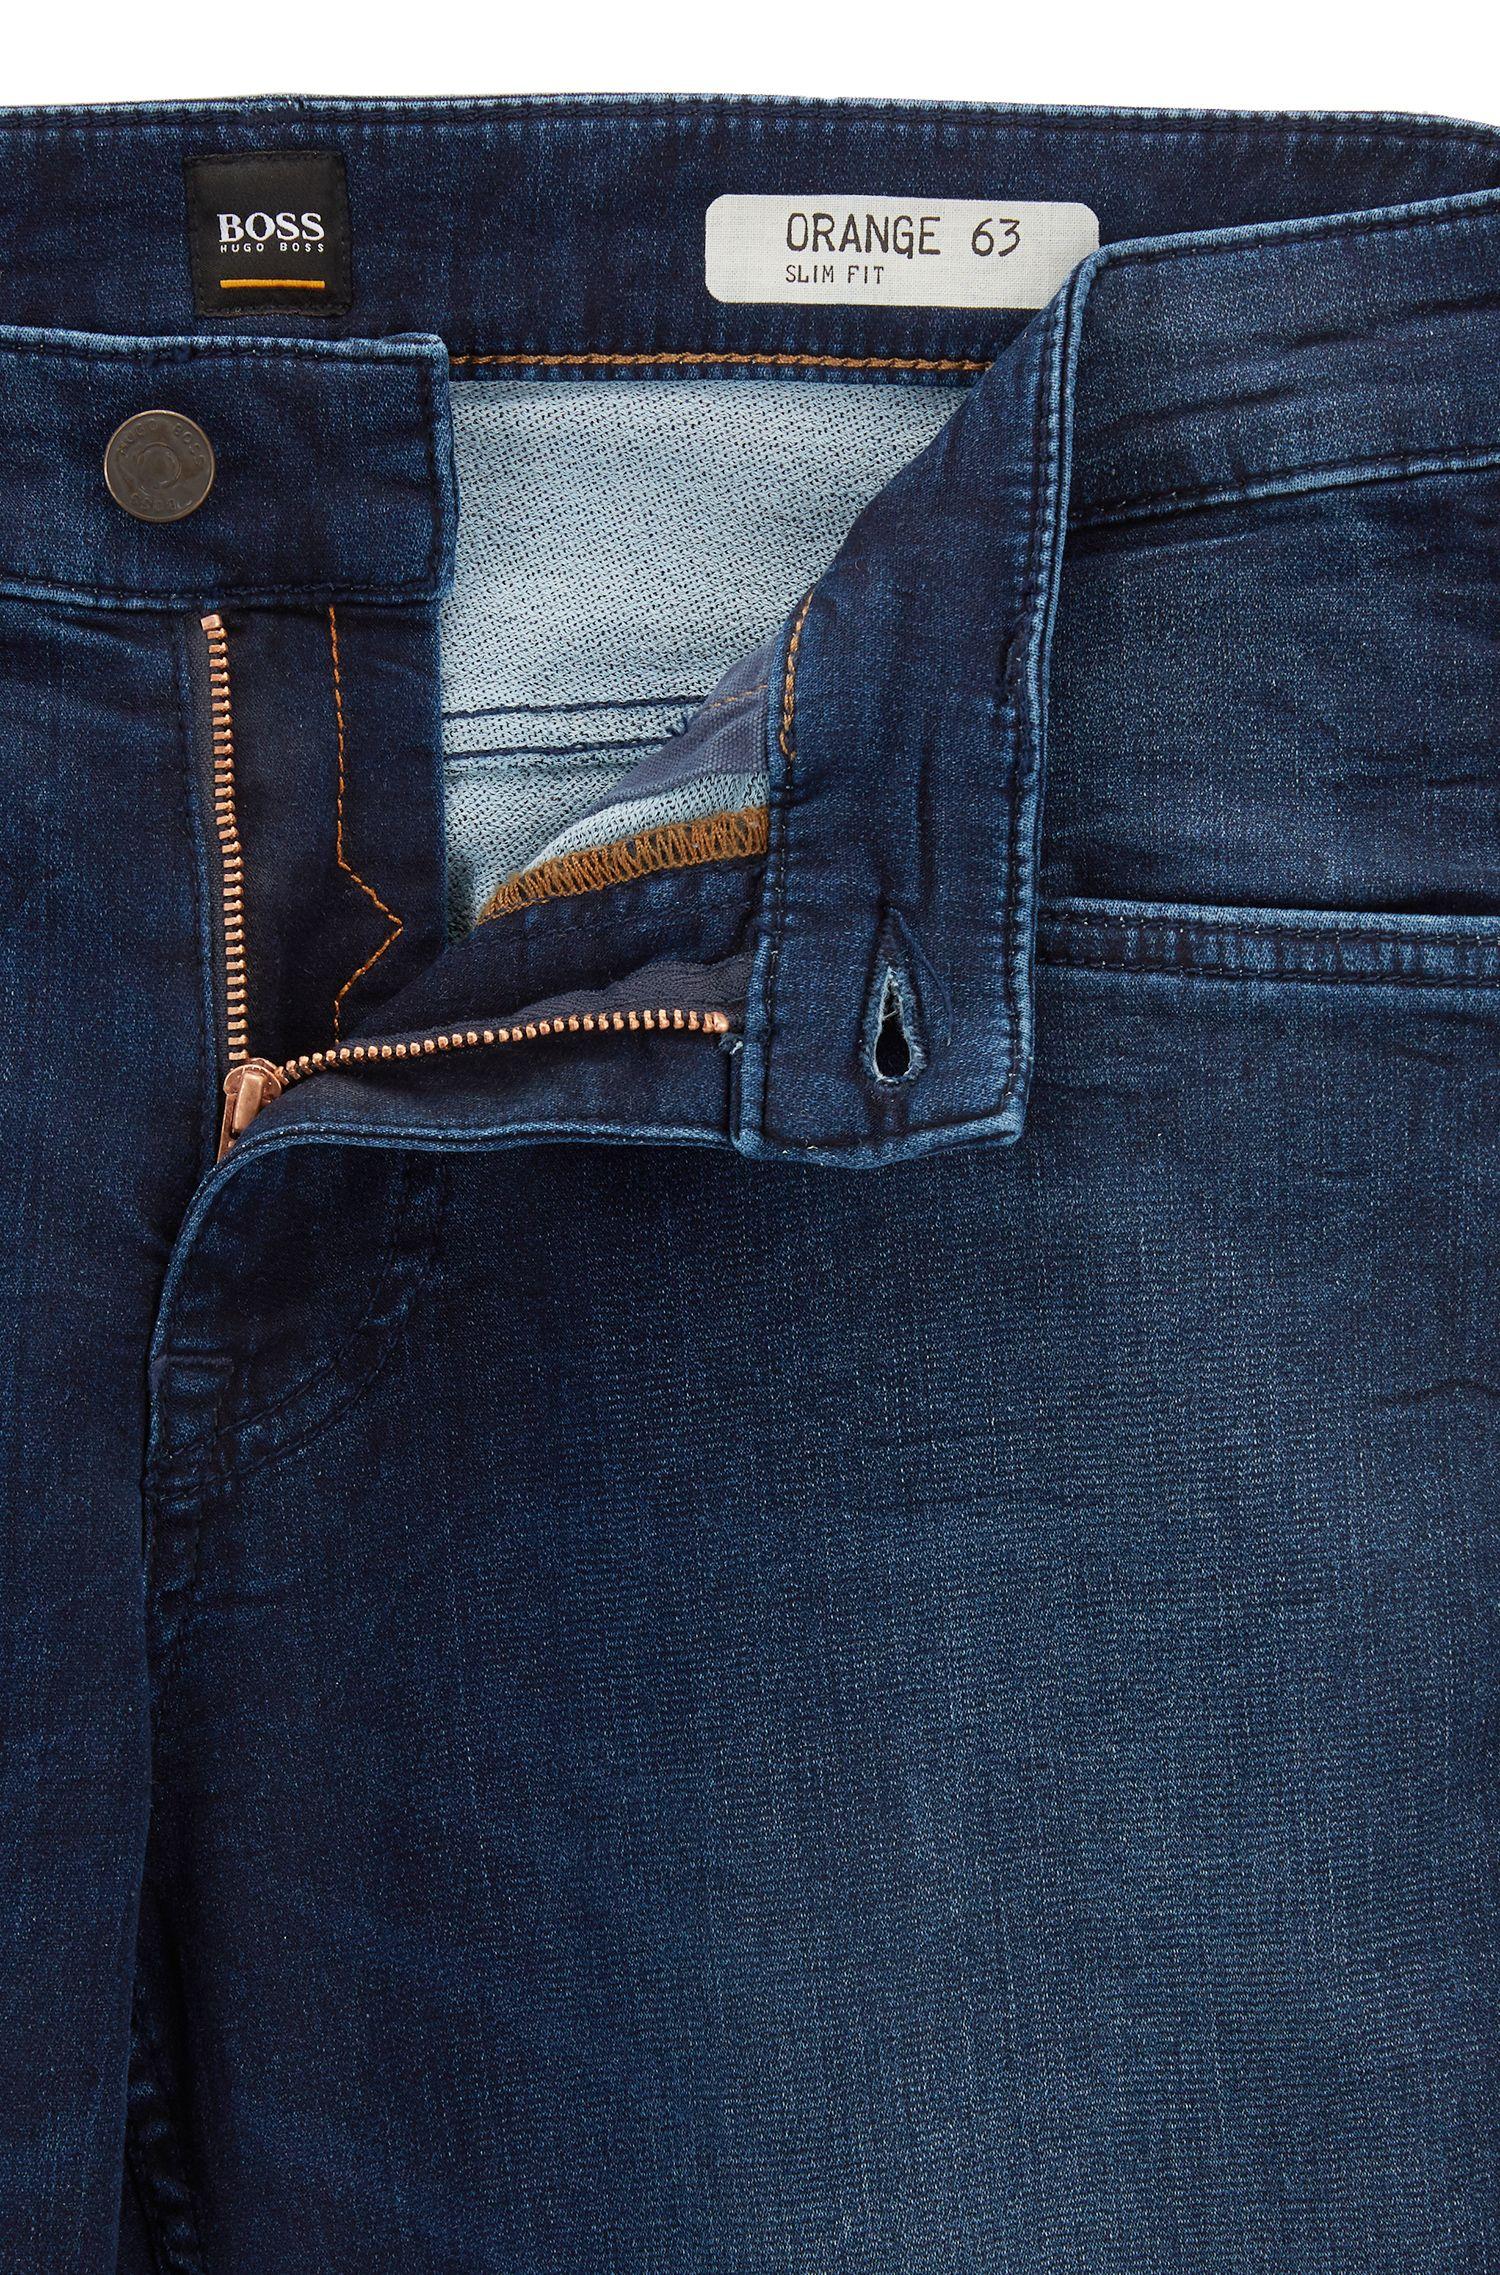 Cotton Blend Jean, Slim Fit   Orange63 Helsinki P, Dark Blue